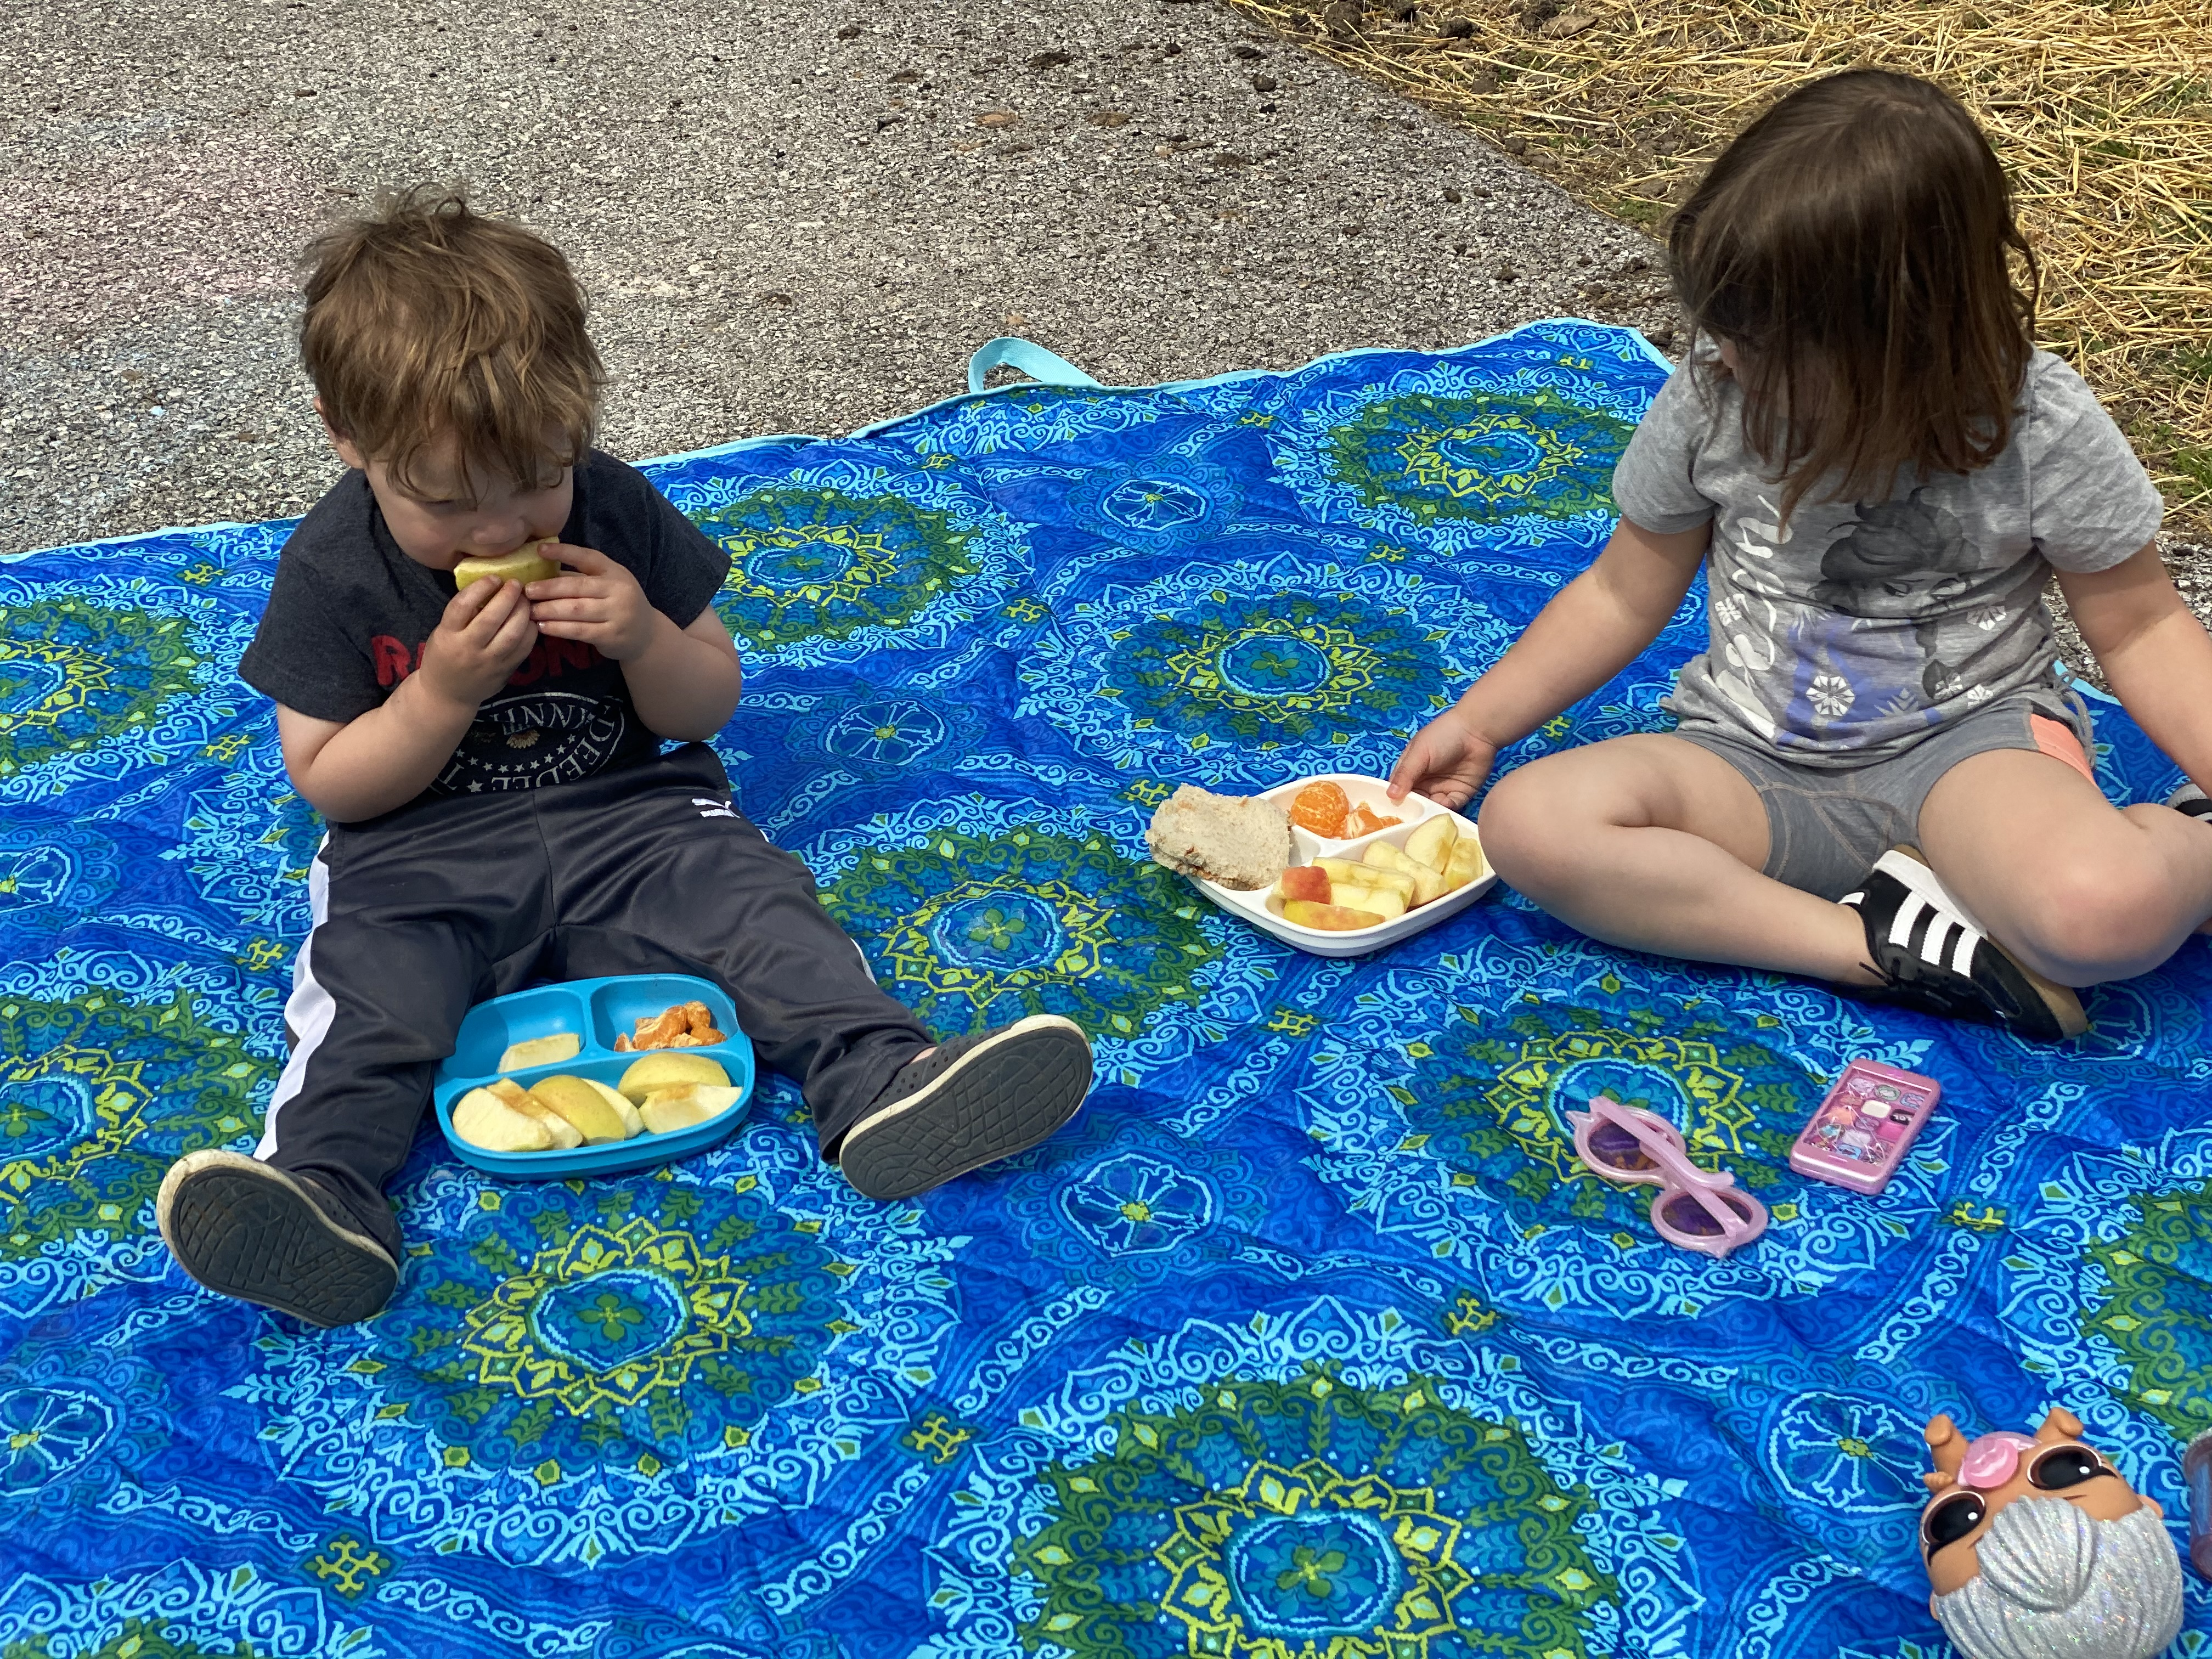 Driveway picnic